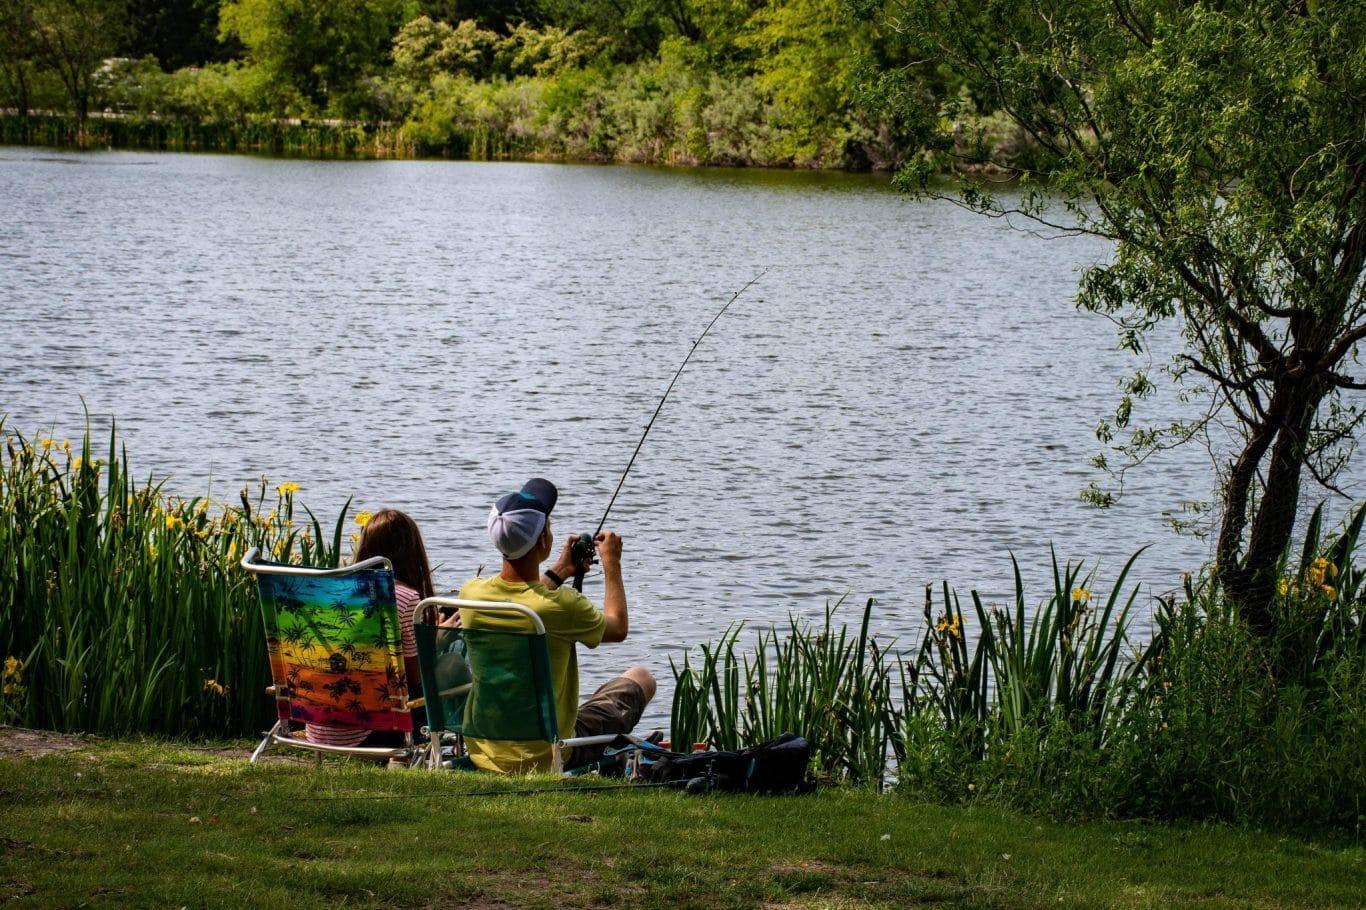 bass fishing a lake in pennsylvania